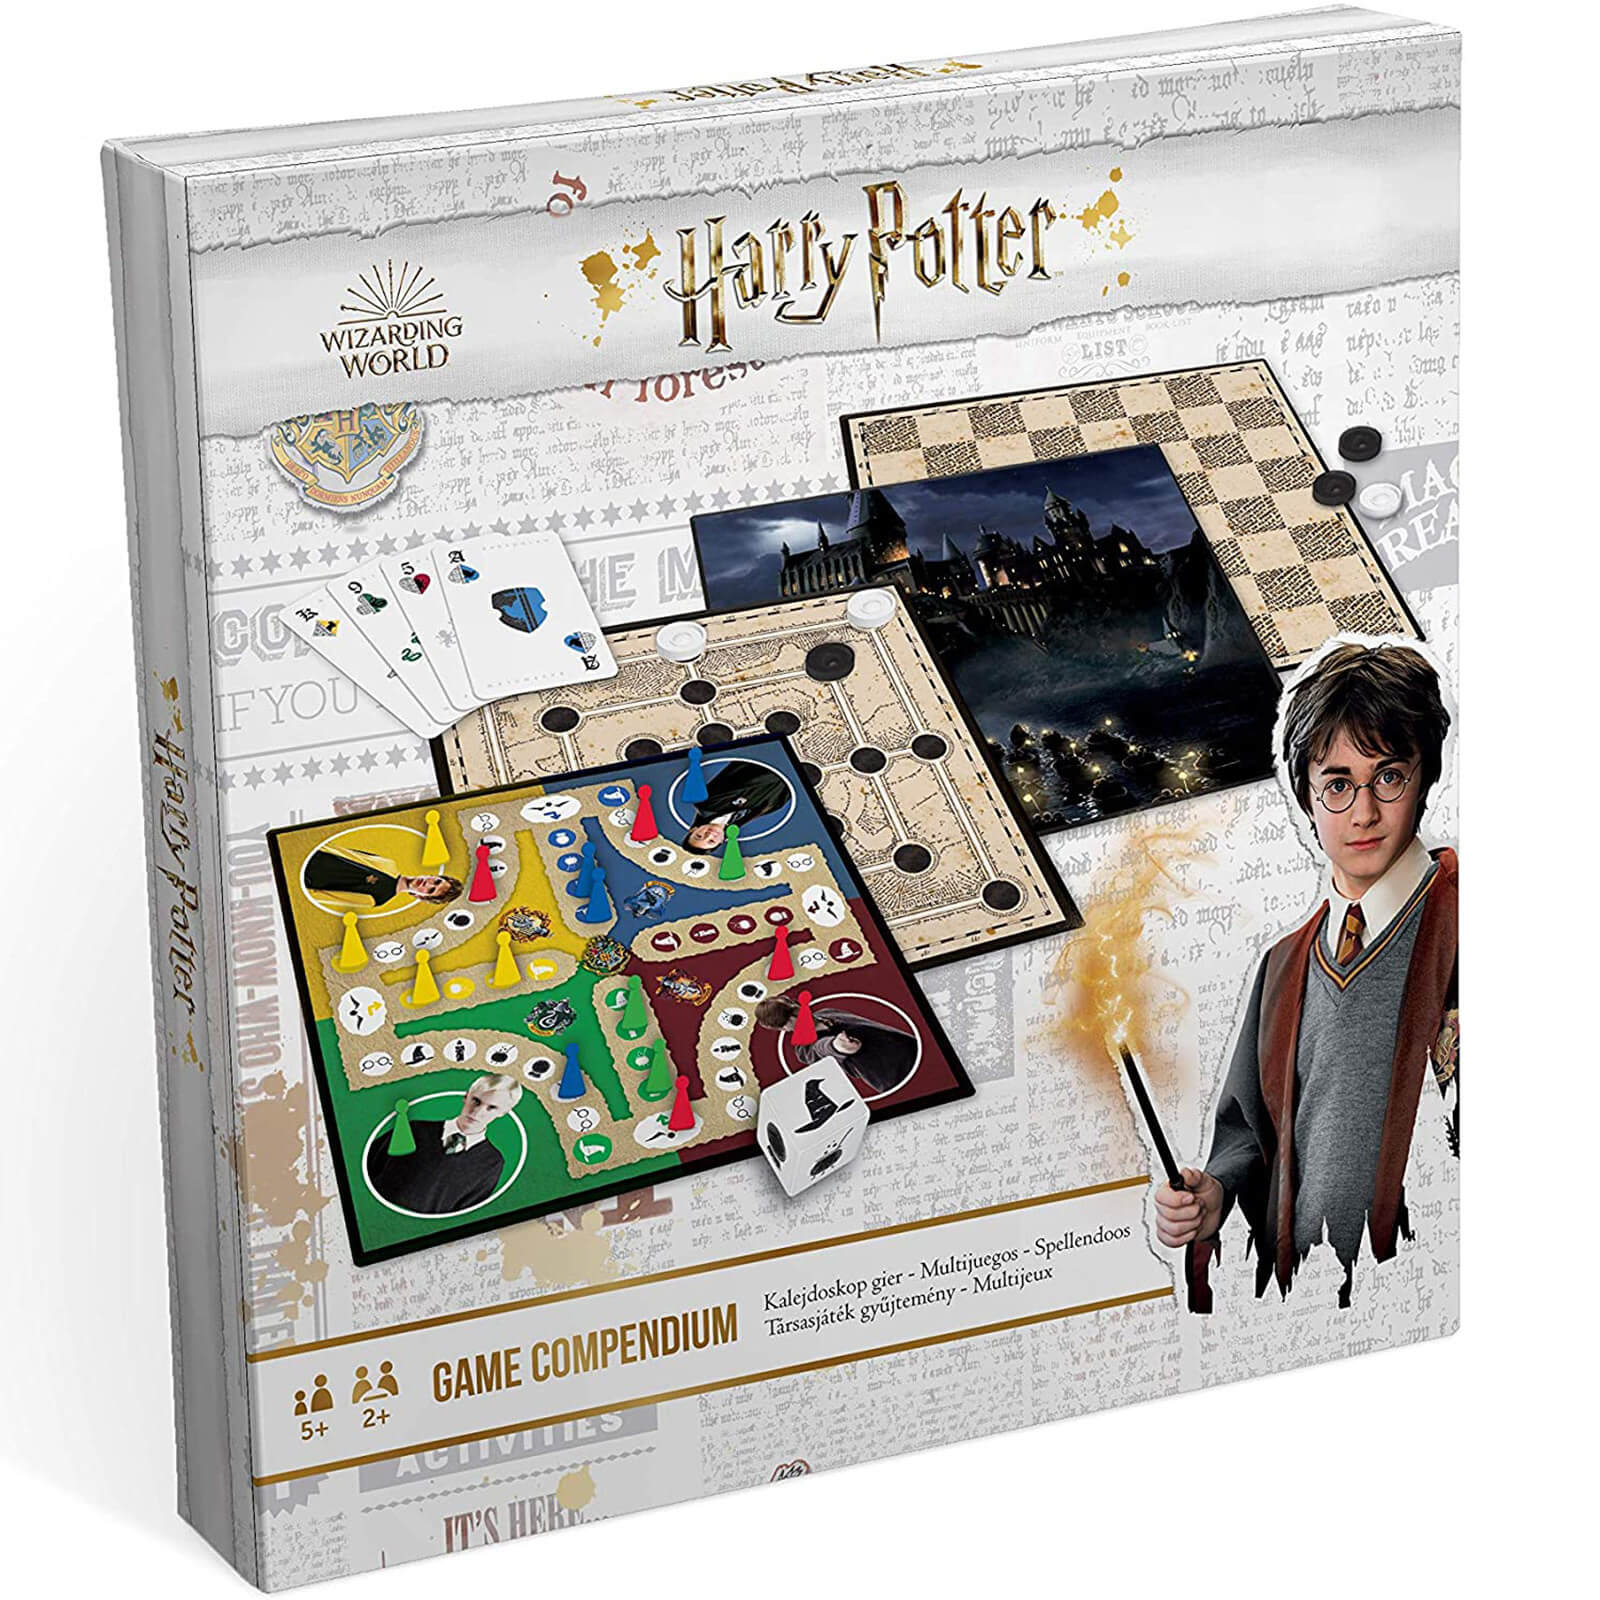 Image of Harry Potter Games Compendium